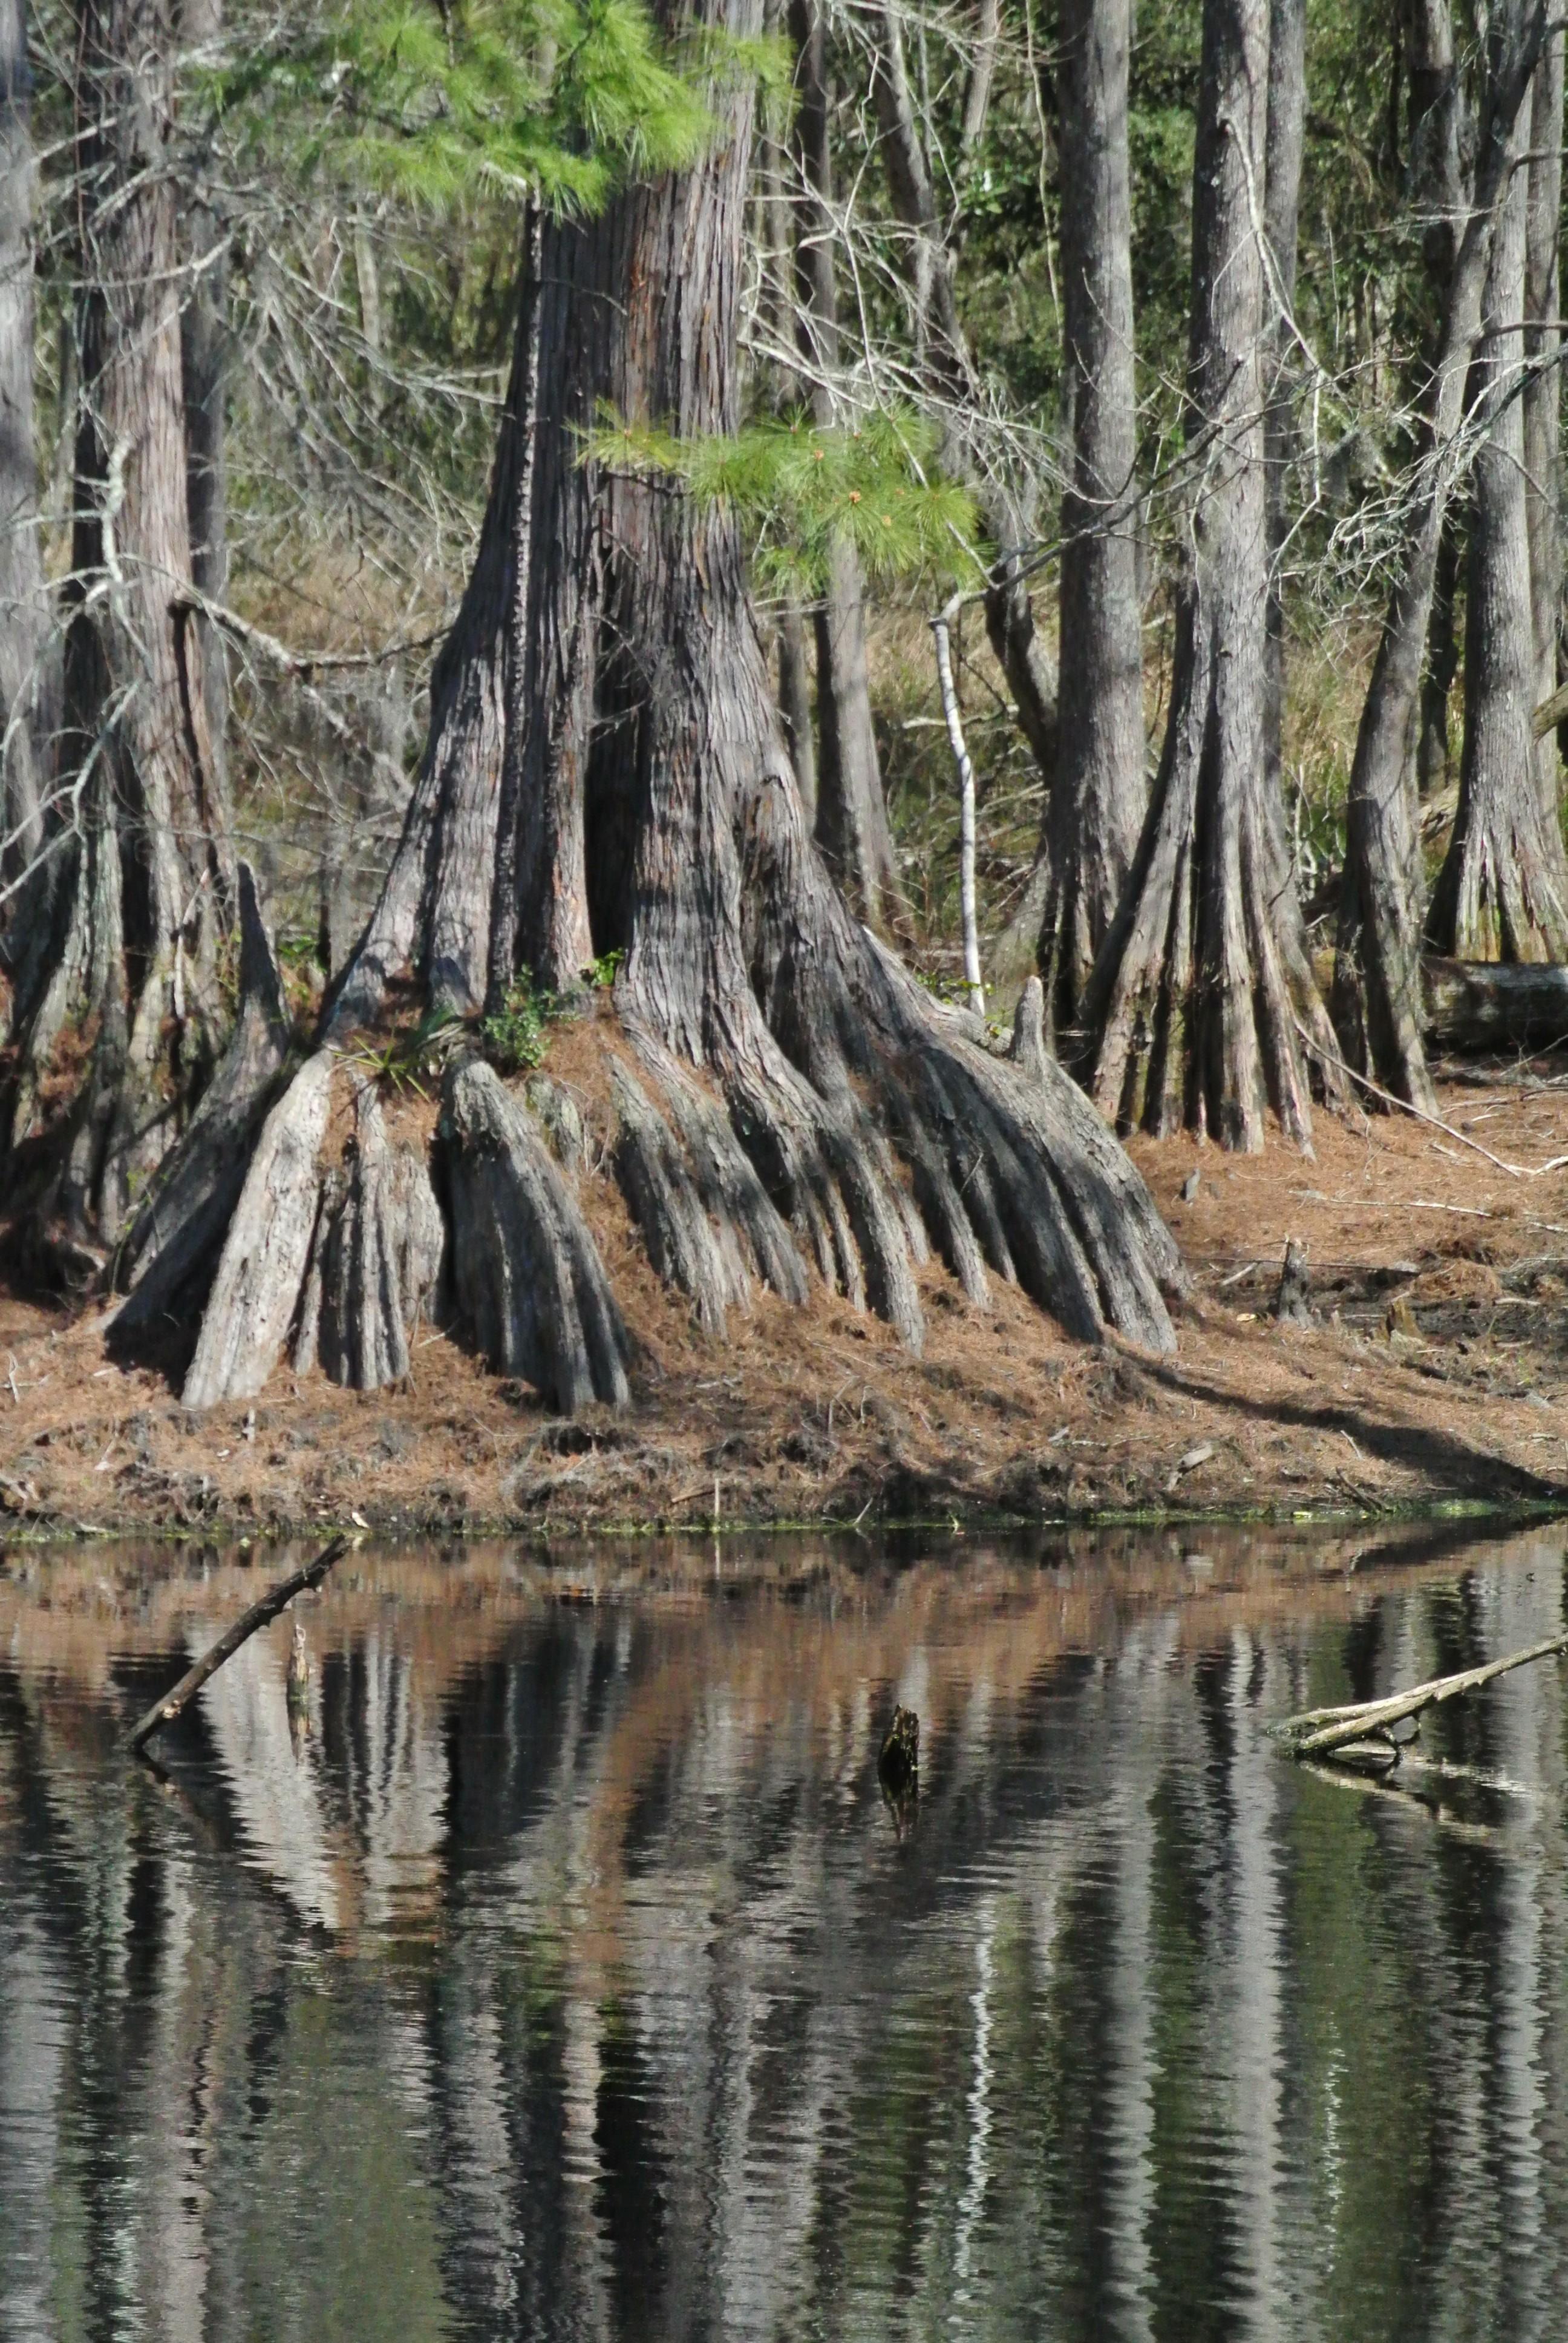 One of the many large Cypress trees ringing Lake Isabel.